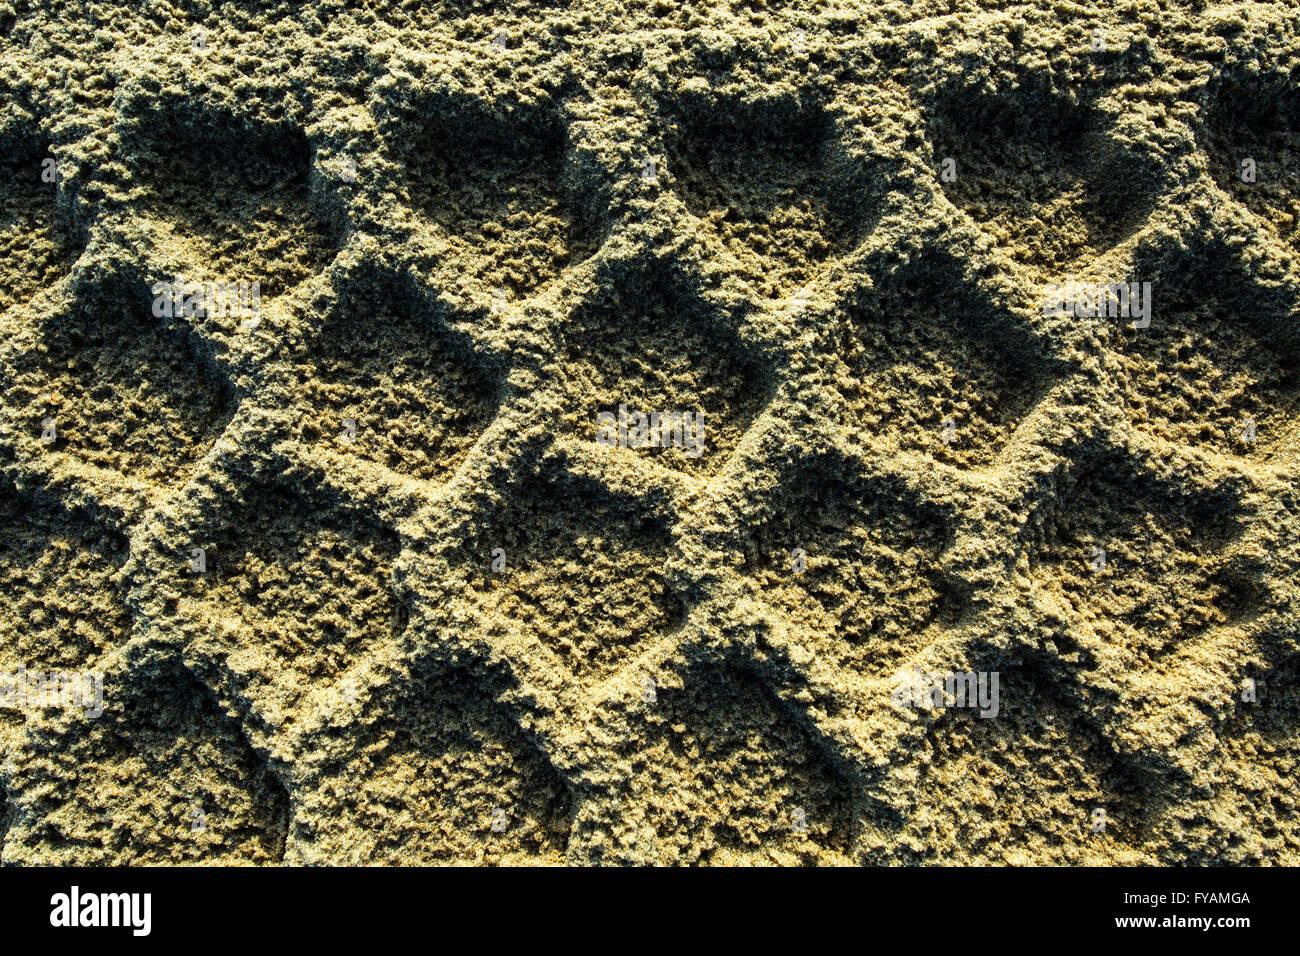 Tire Tracks on sandy ground - Stock Image